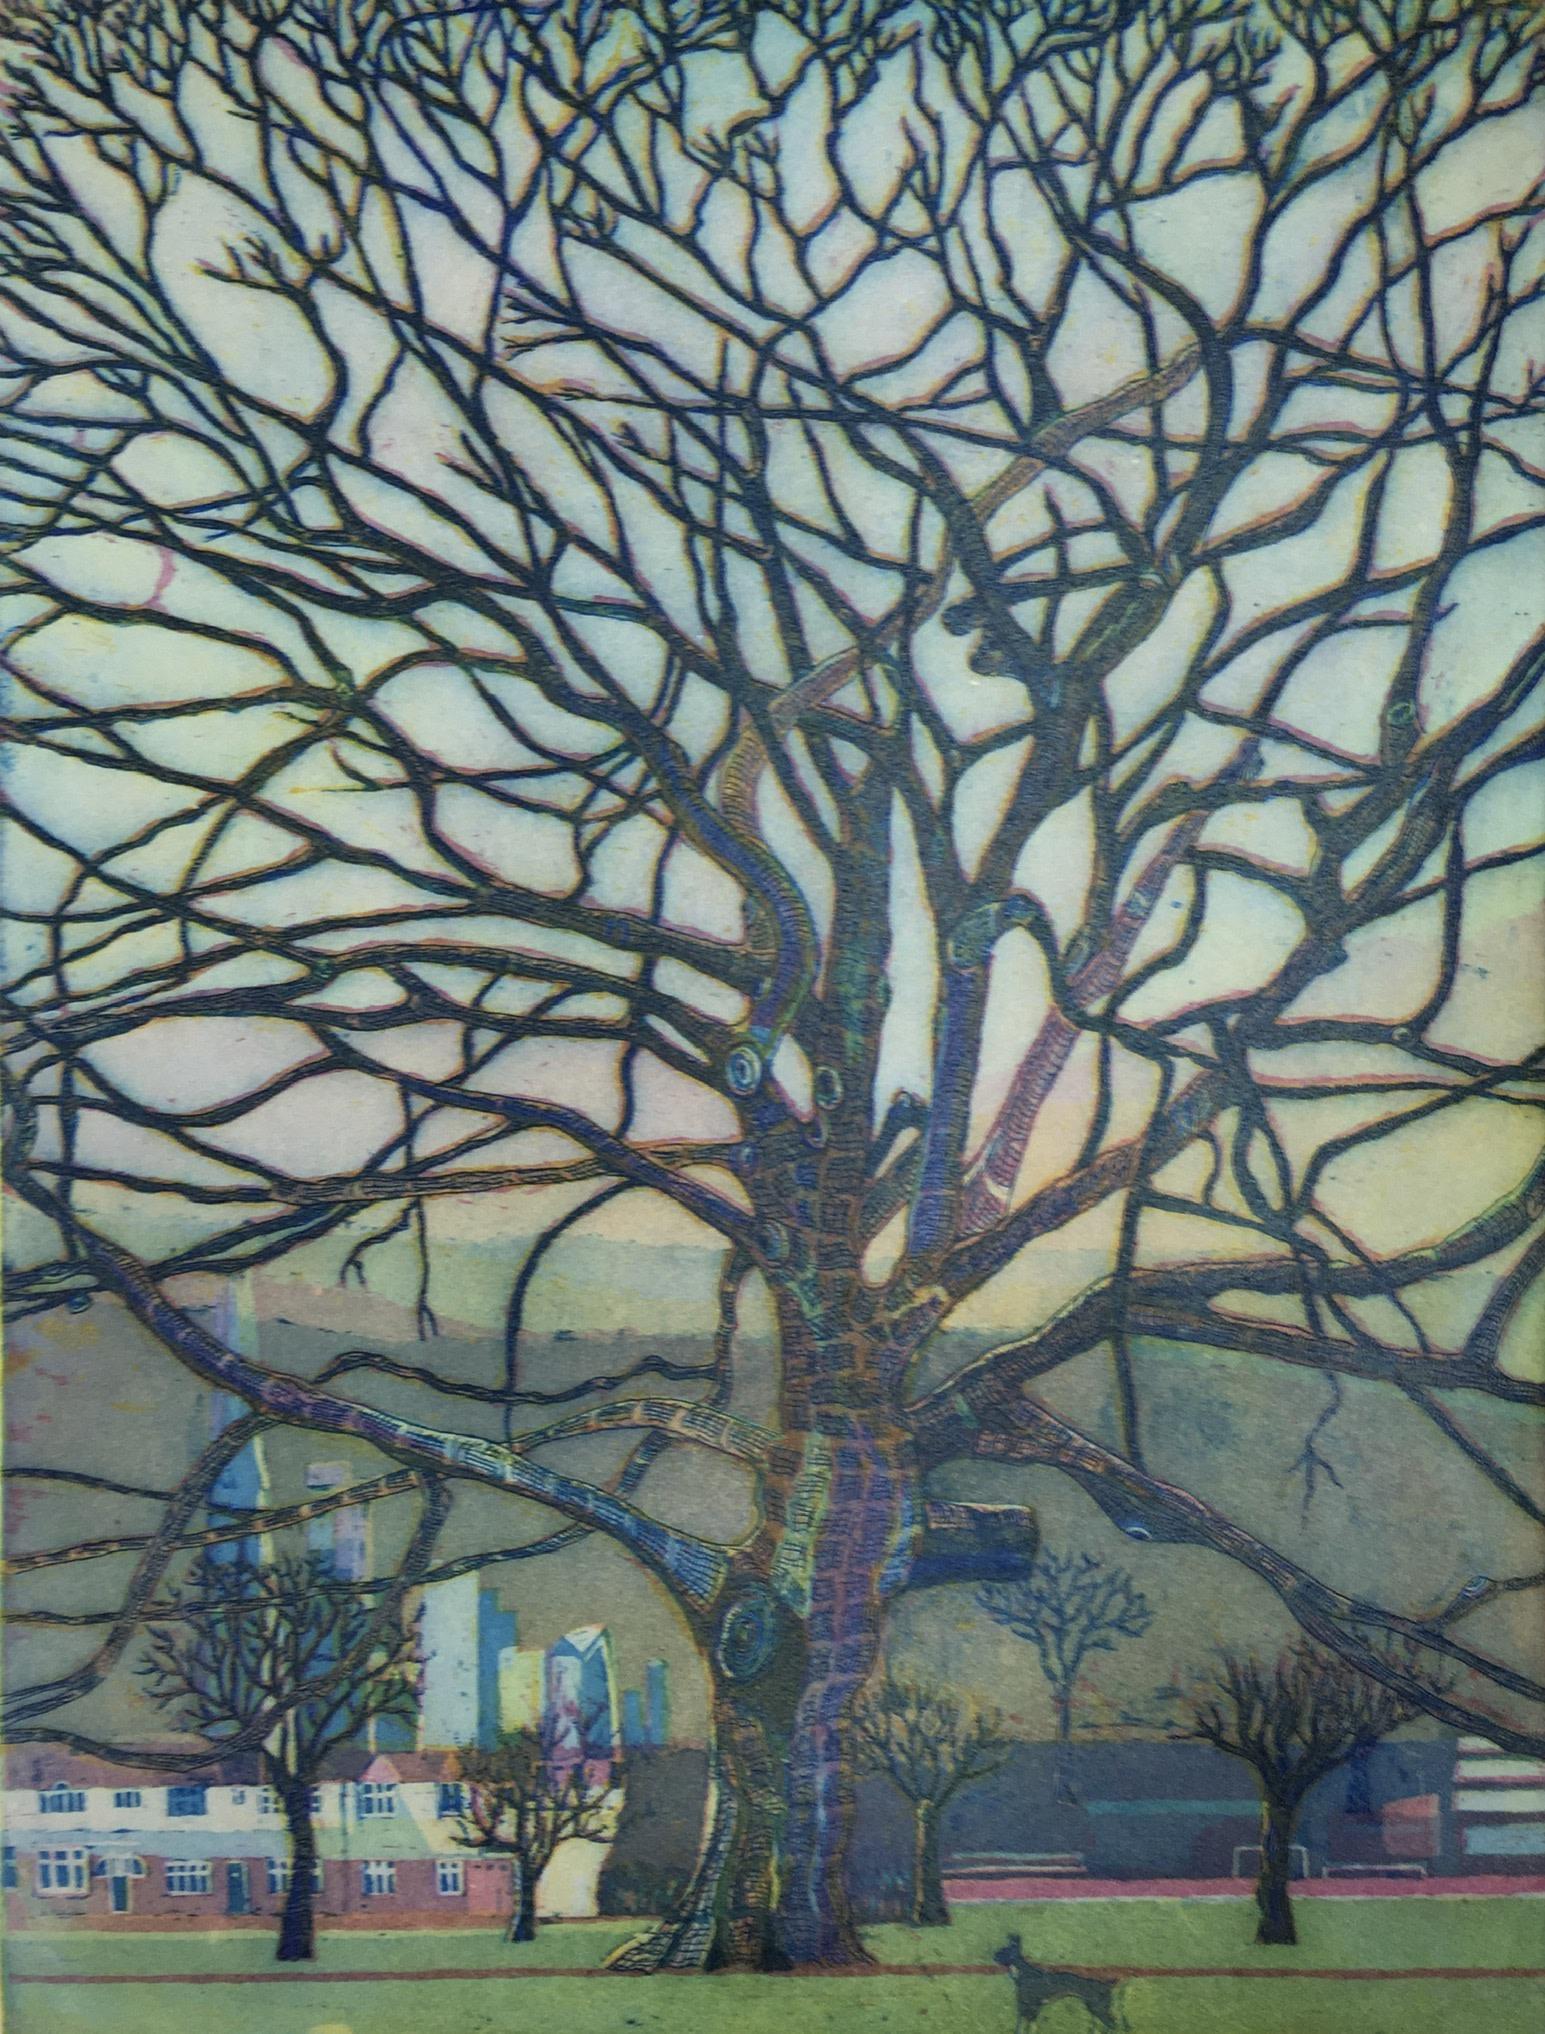 "<span class=""link fancybox-details-link""><a href=""/artists/86-karen-keogh-re/works/11061/"">View Detail Page</a></span><div class=""artist""><span class=""artist""><strong>Karen Keogh RE</strong></span></div><div class=""title""><em>The Old Oak Tree, Ruskin Park</em></div><div class=""medium"">etching</div><div class=""dimensions"">50 x 40 cm framed size<br /> 40 x 30 cm image size</div><div class=""edition_details"">edition of 75</div><div class=""price"">£390.00 framed<br>£290.00 unframed</div>"